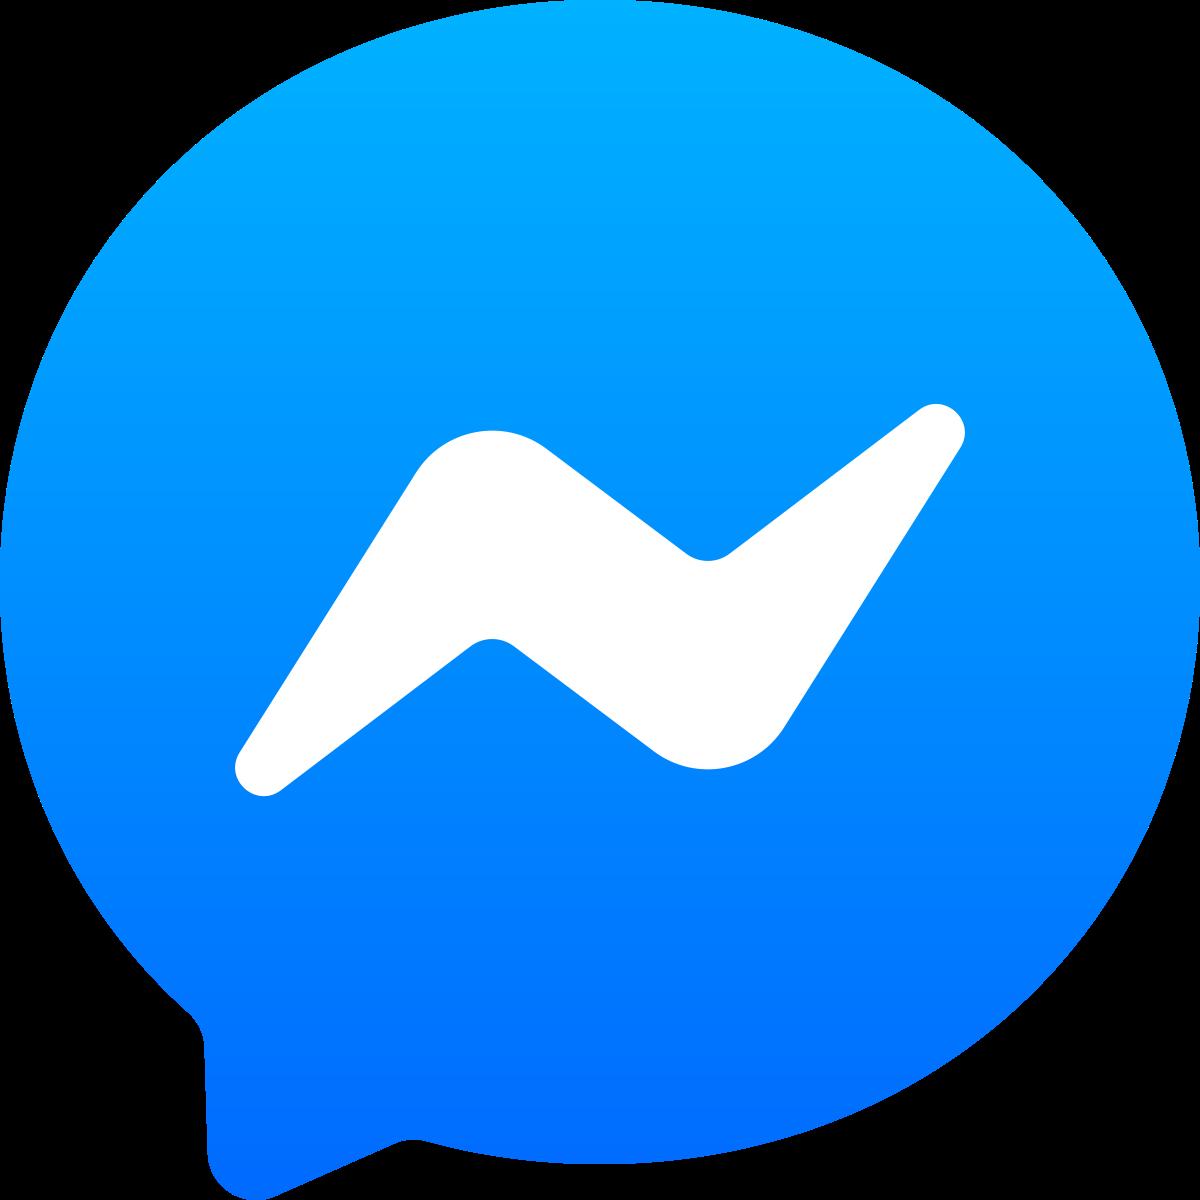 logo_messenger.png